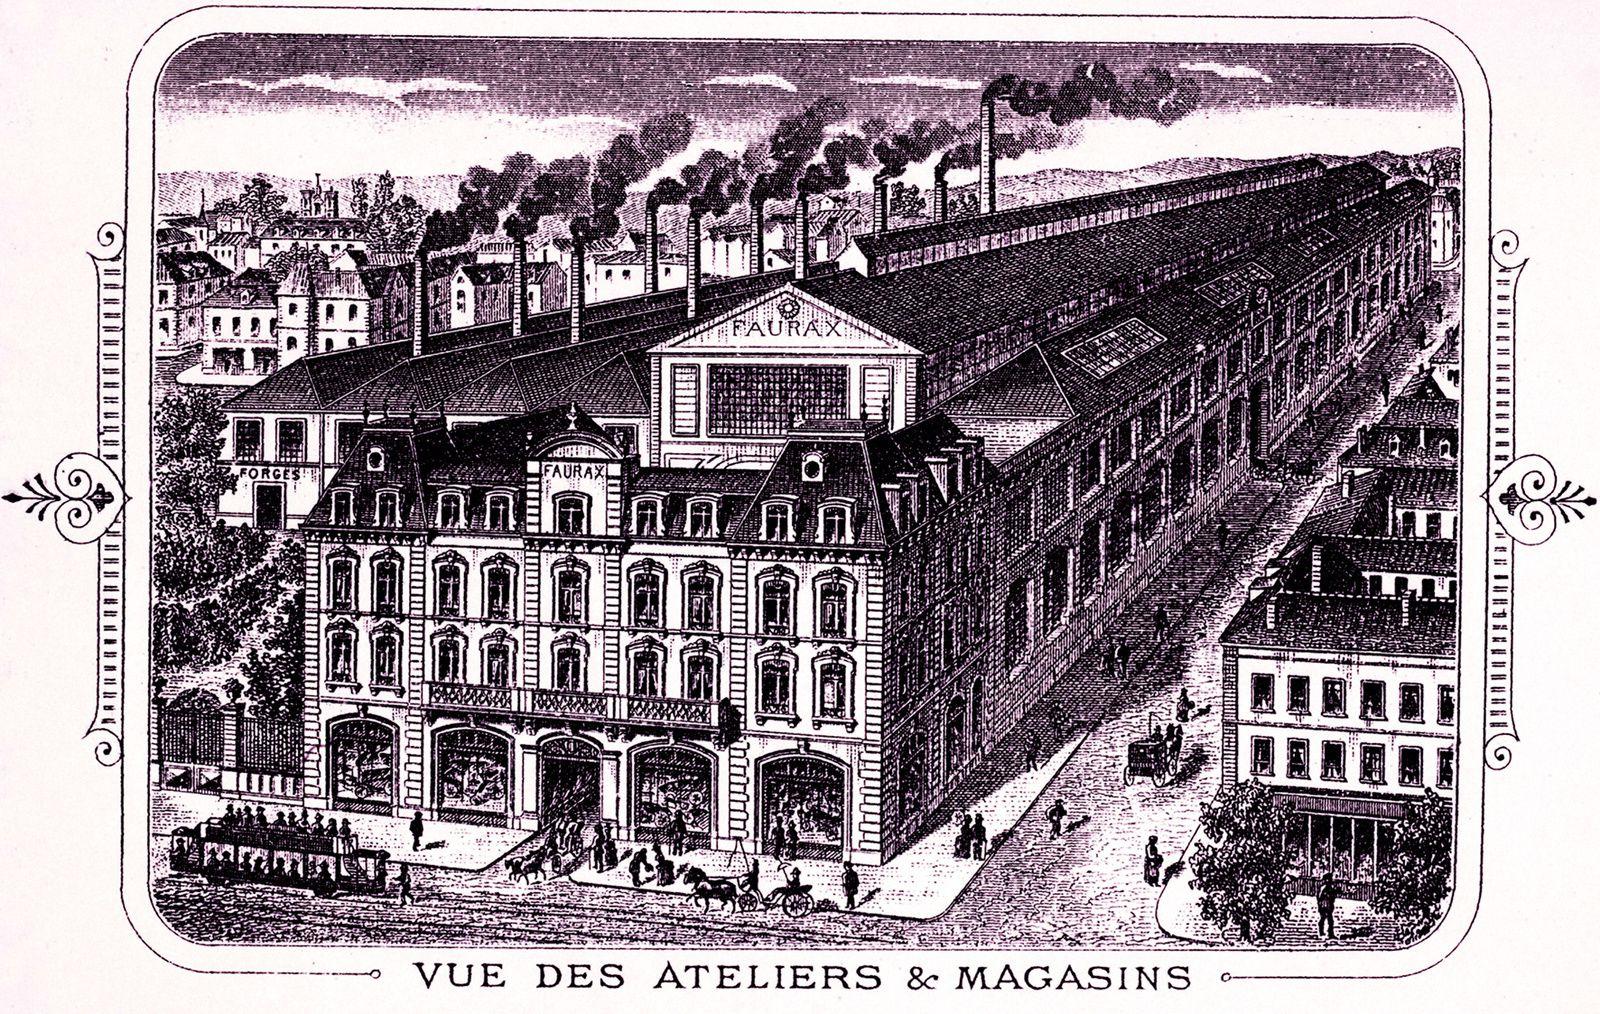 Locaux Faurax Léon en 1890 (source: Fondation Berliet Lyon)